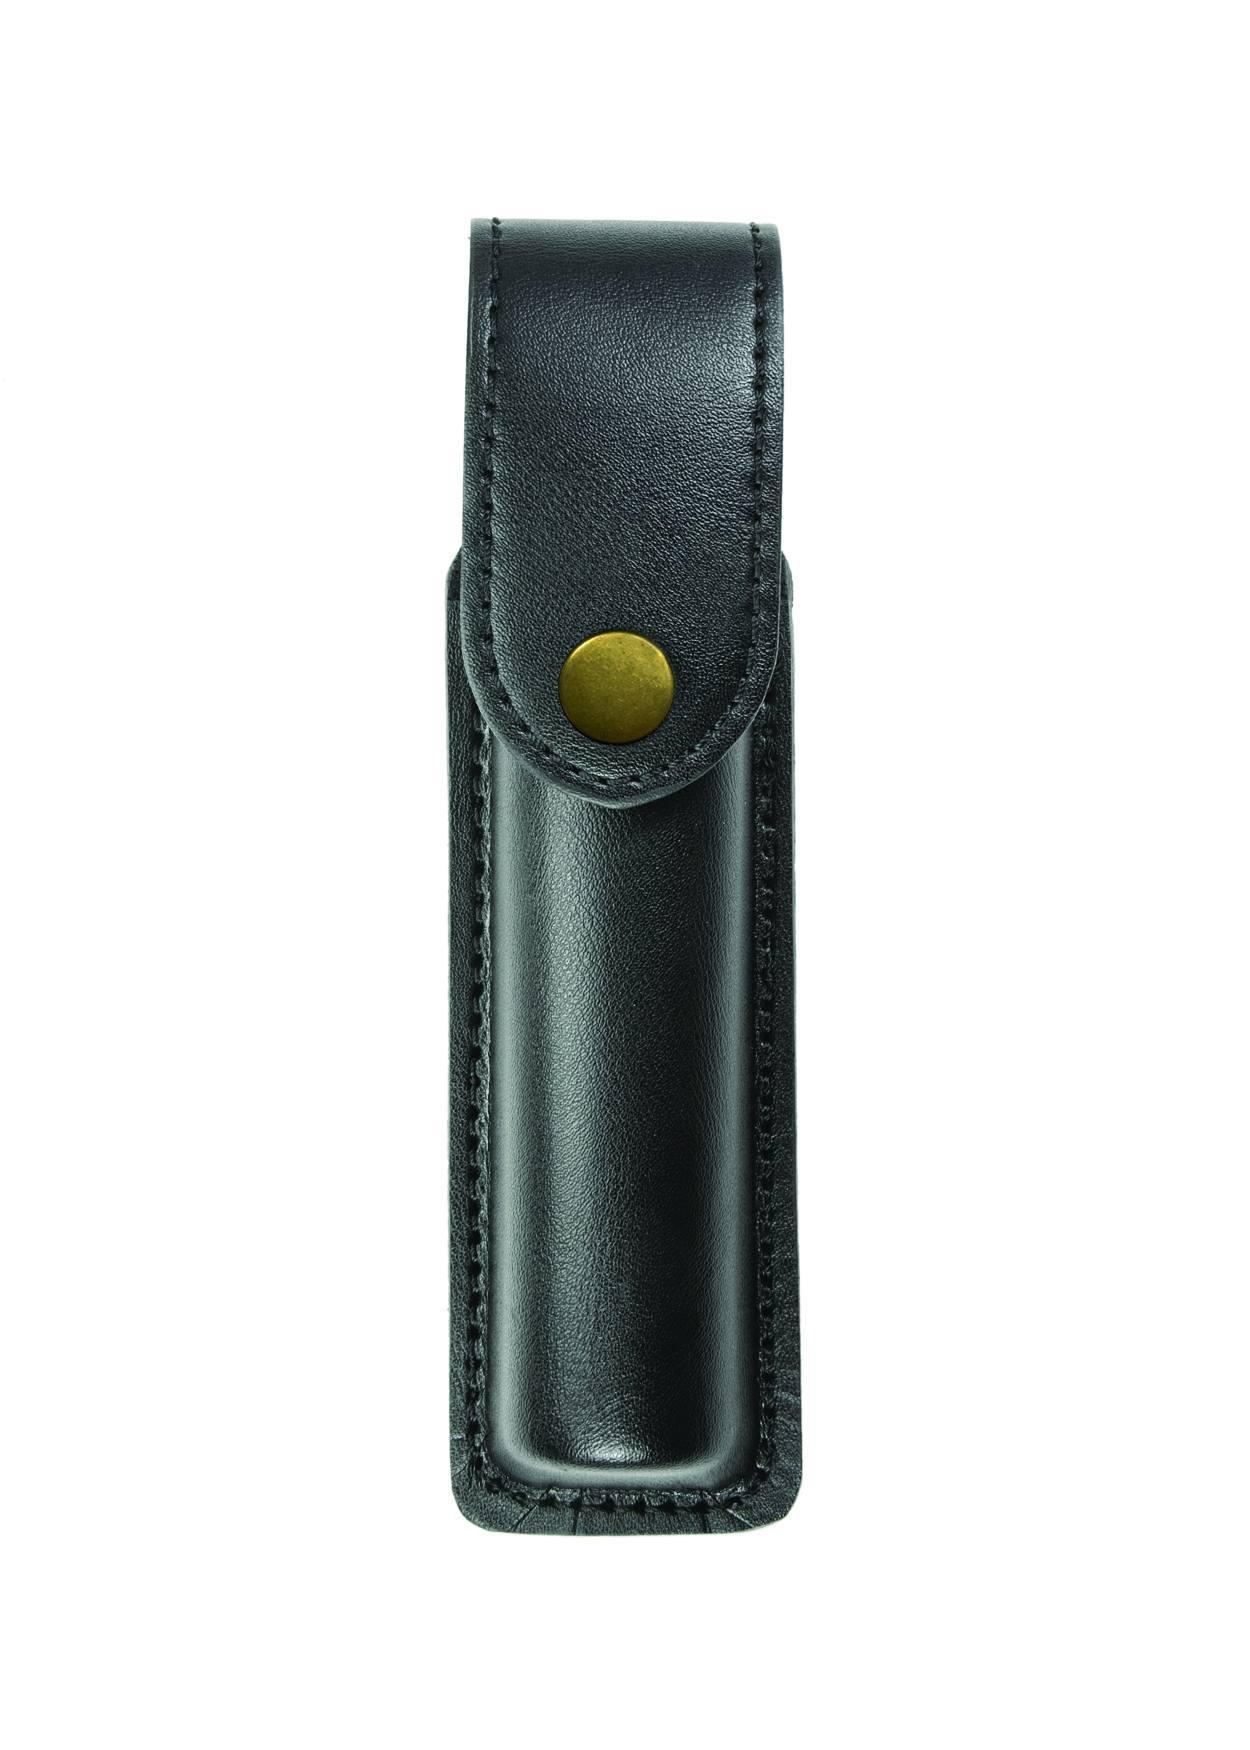 Flashlight Case, Medium, AirTek, Smooth, Gold Snap-